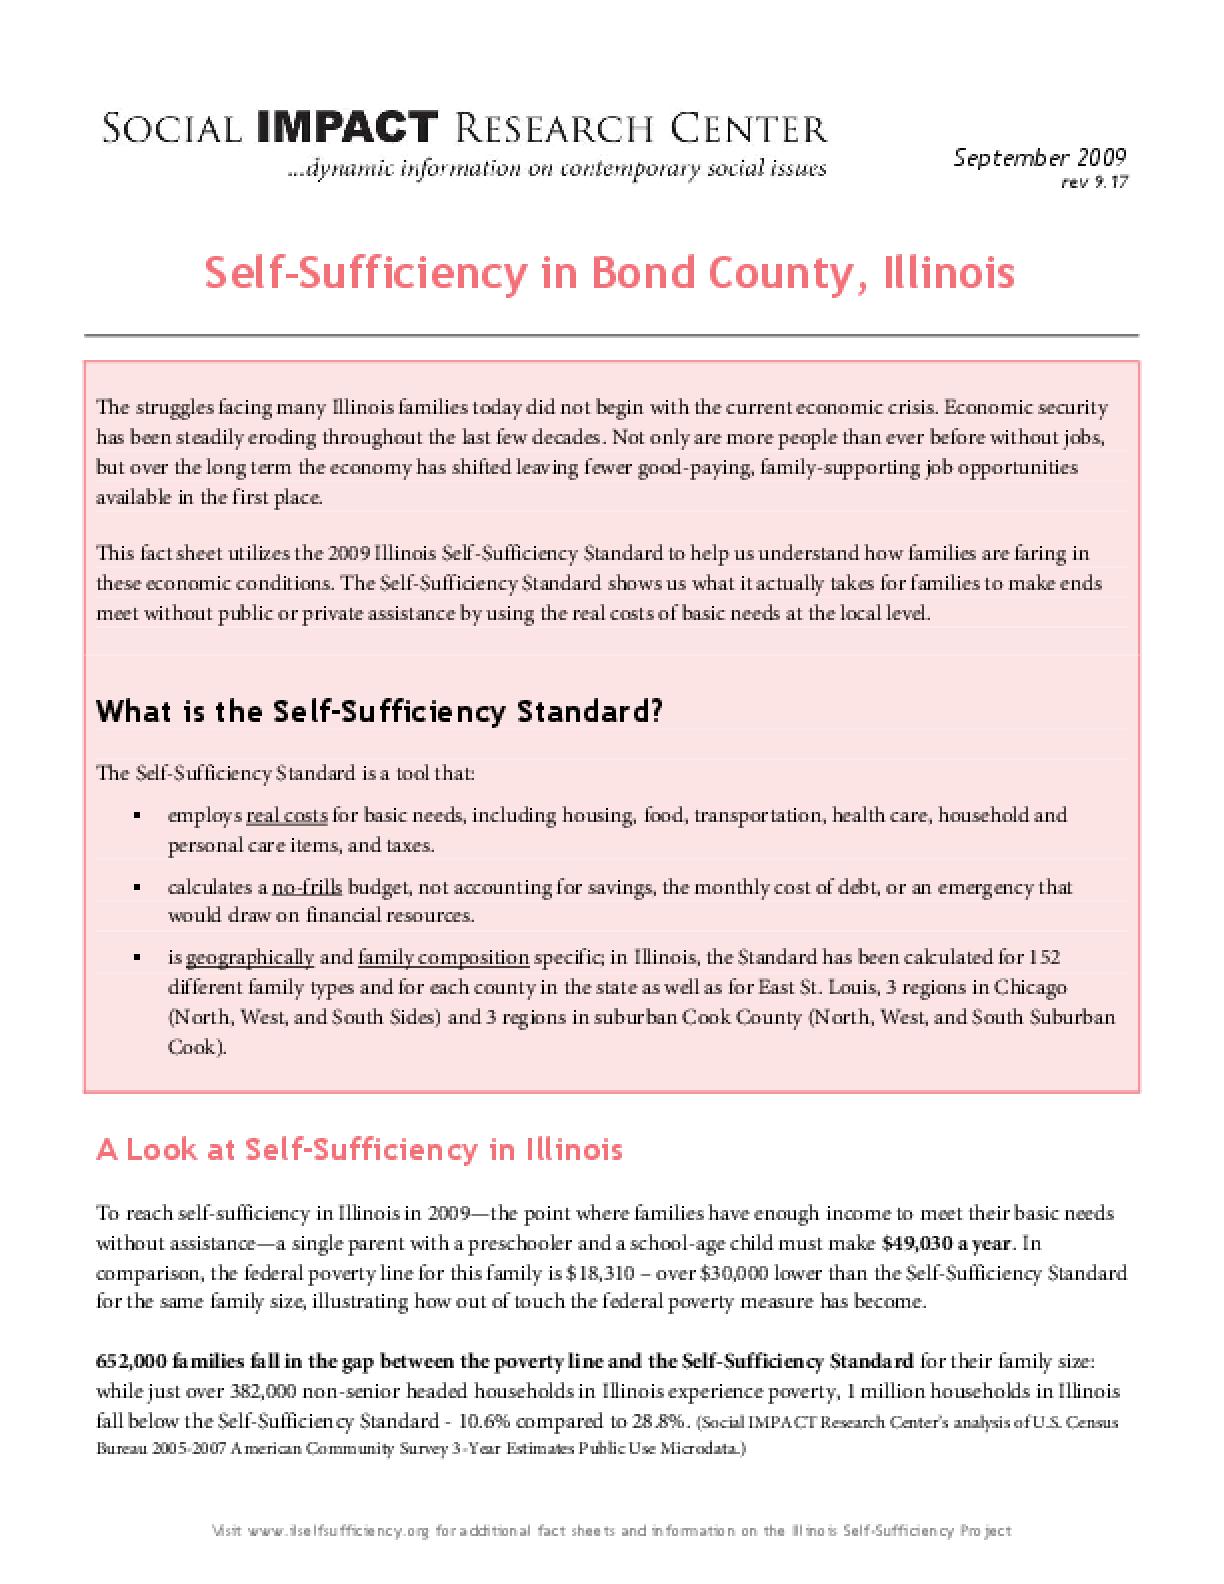 Self-Sufficiency in Bond County, Illinois